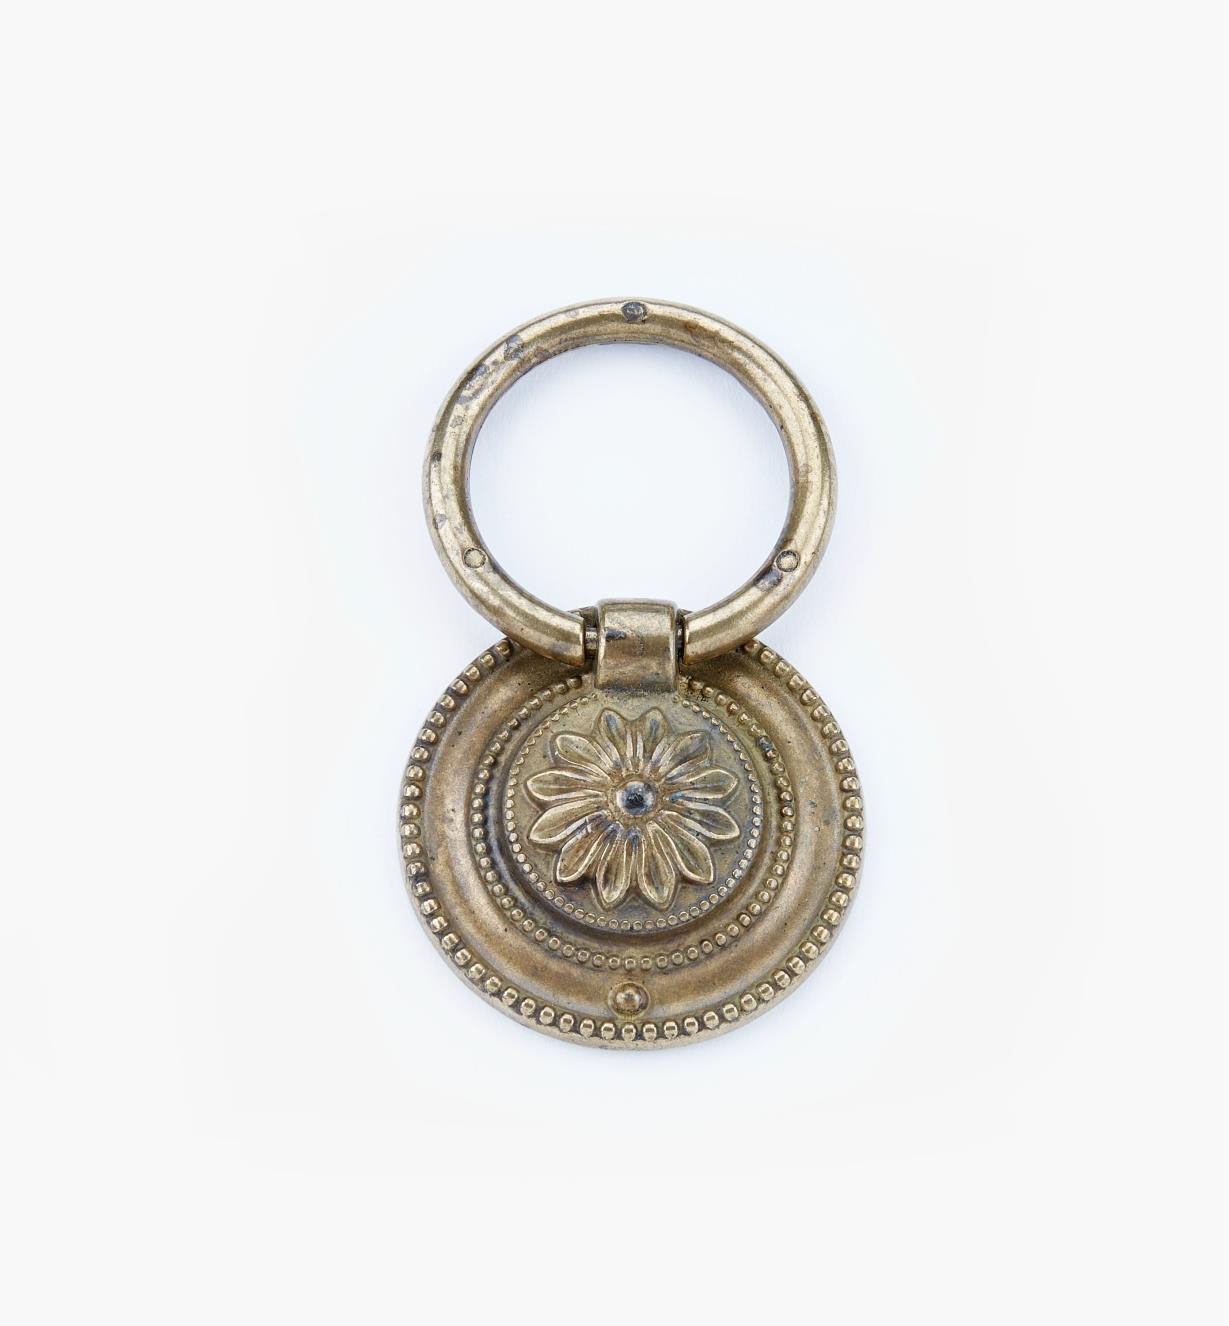 01A7456 - Poignée à anneau Louis XVI, laiton ancien, 56mm